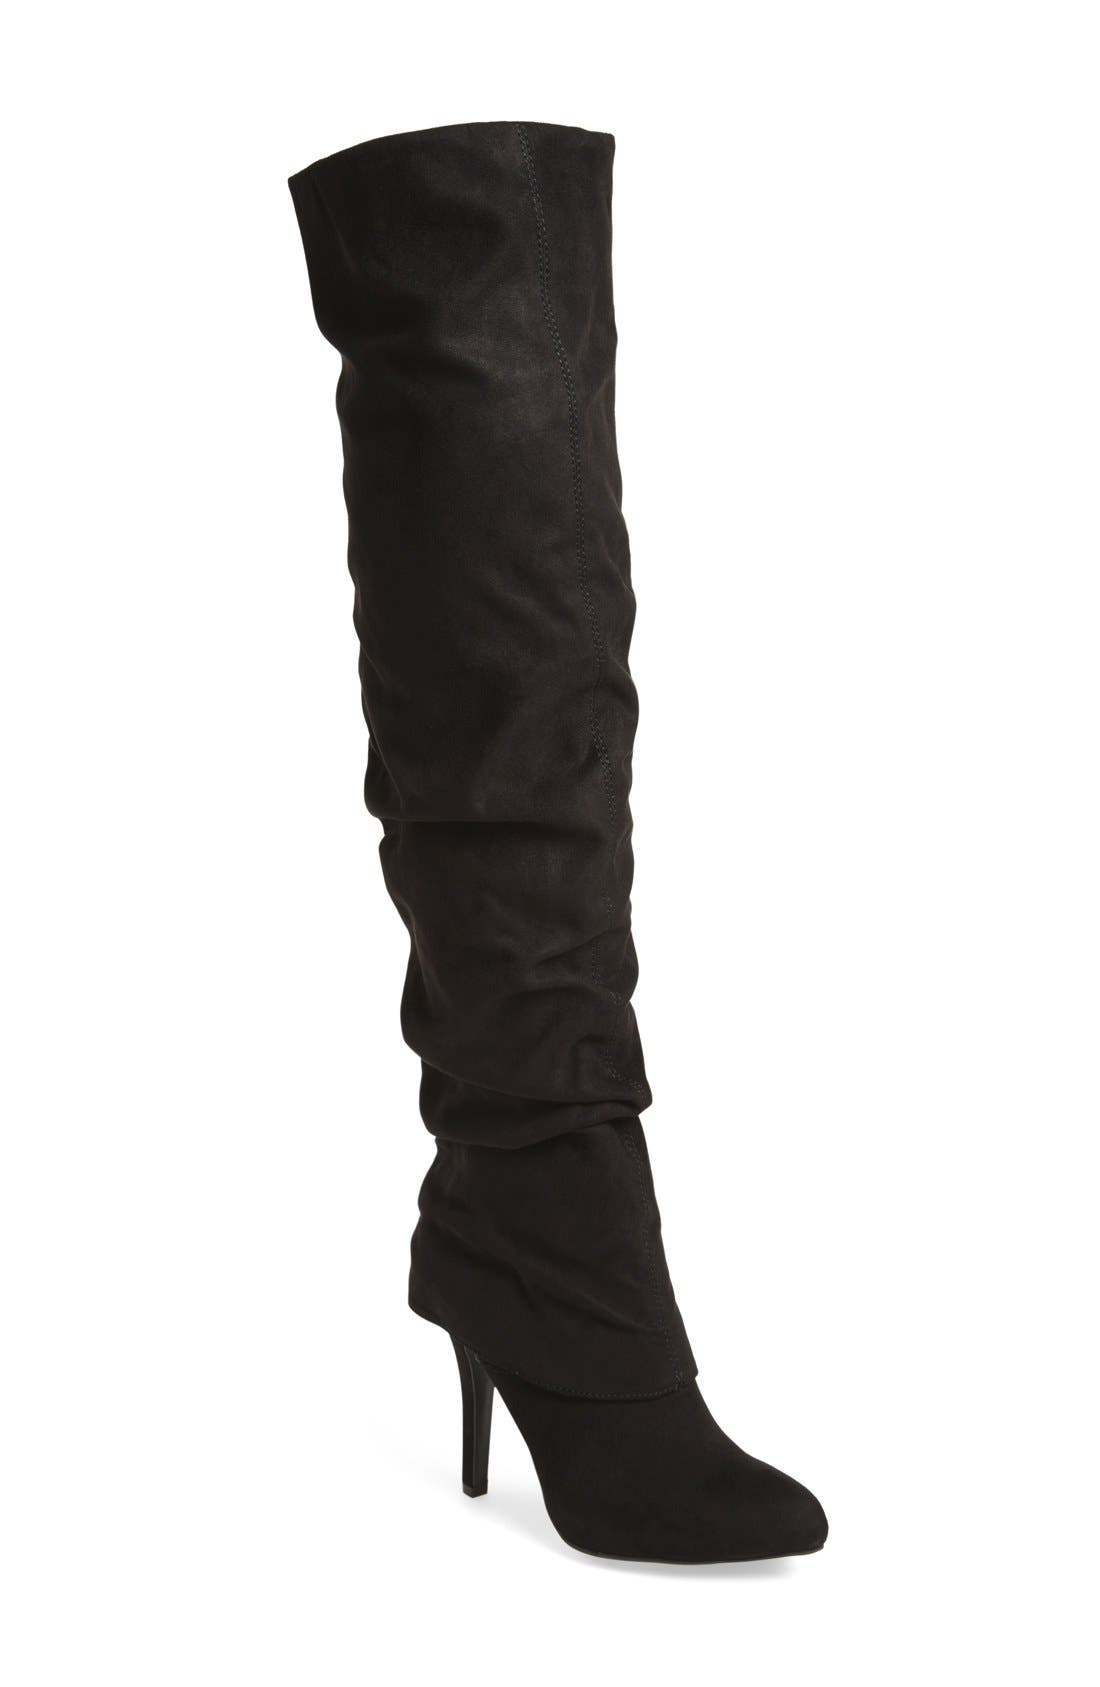 Main Image - Nina 'Kymari' Over the Knee Pointy Toe Boot (Women)